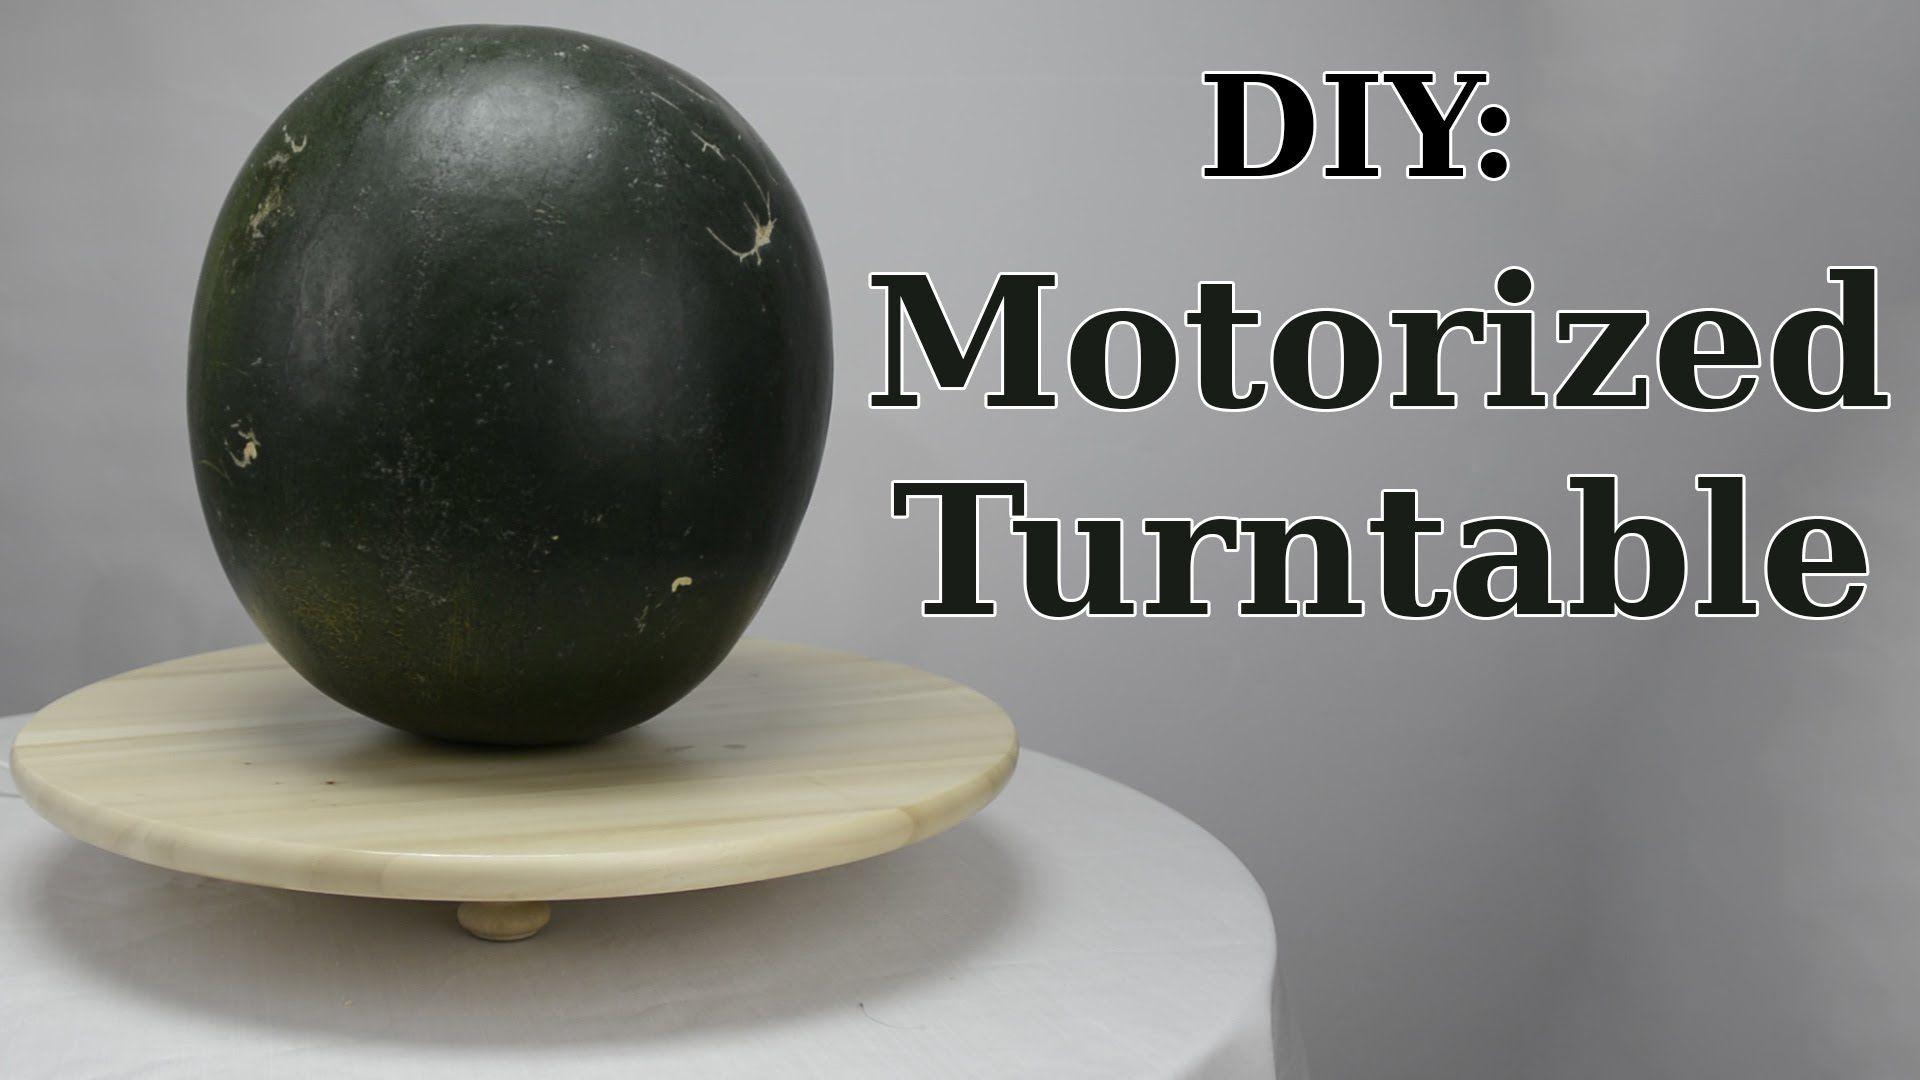 Diy motorized turntable for 12 diy turntable